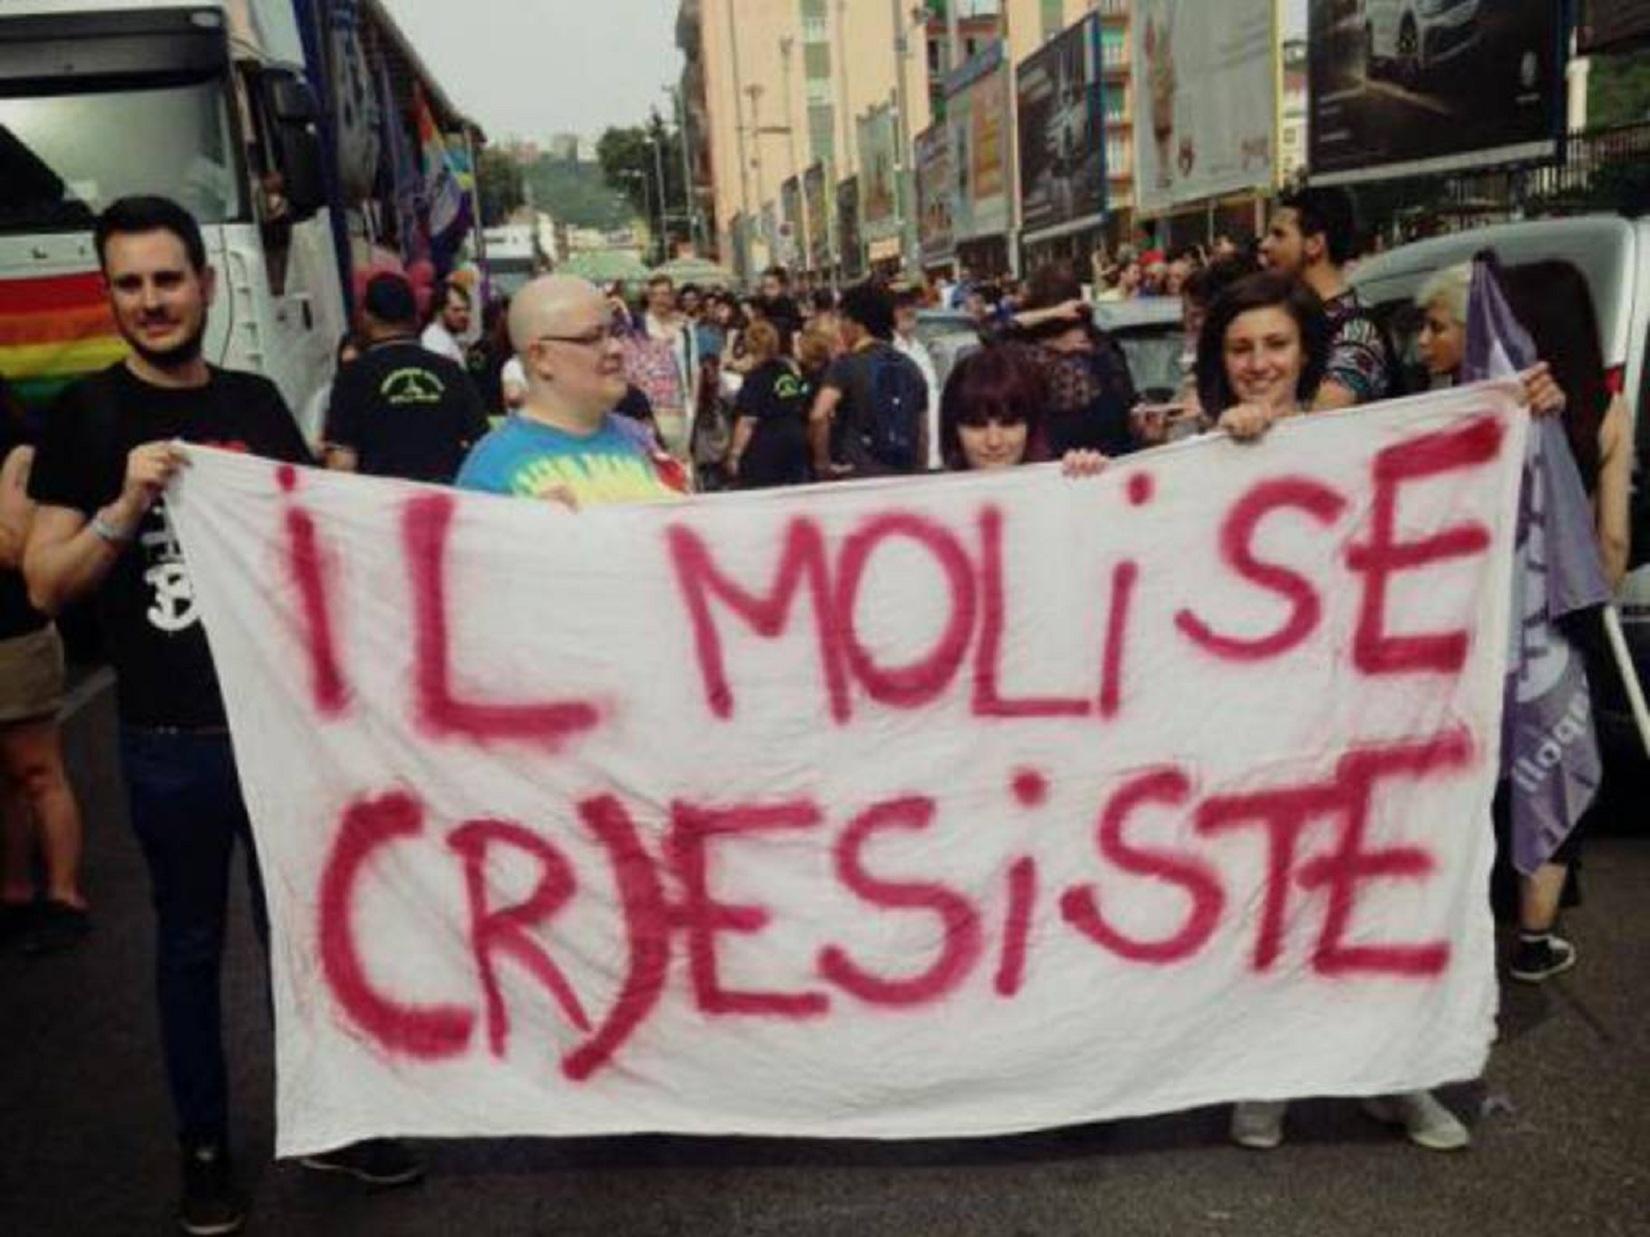 Molise Pride